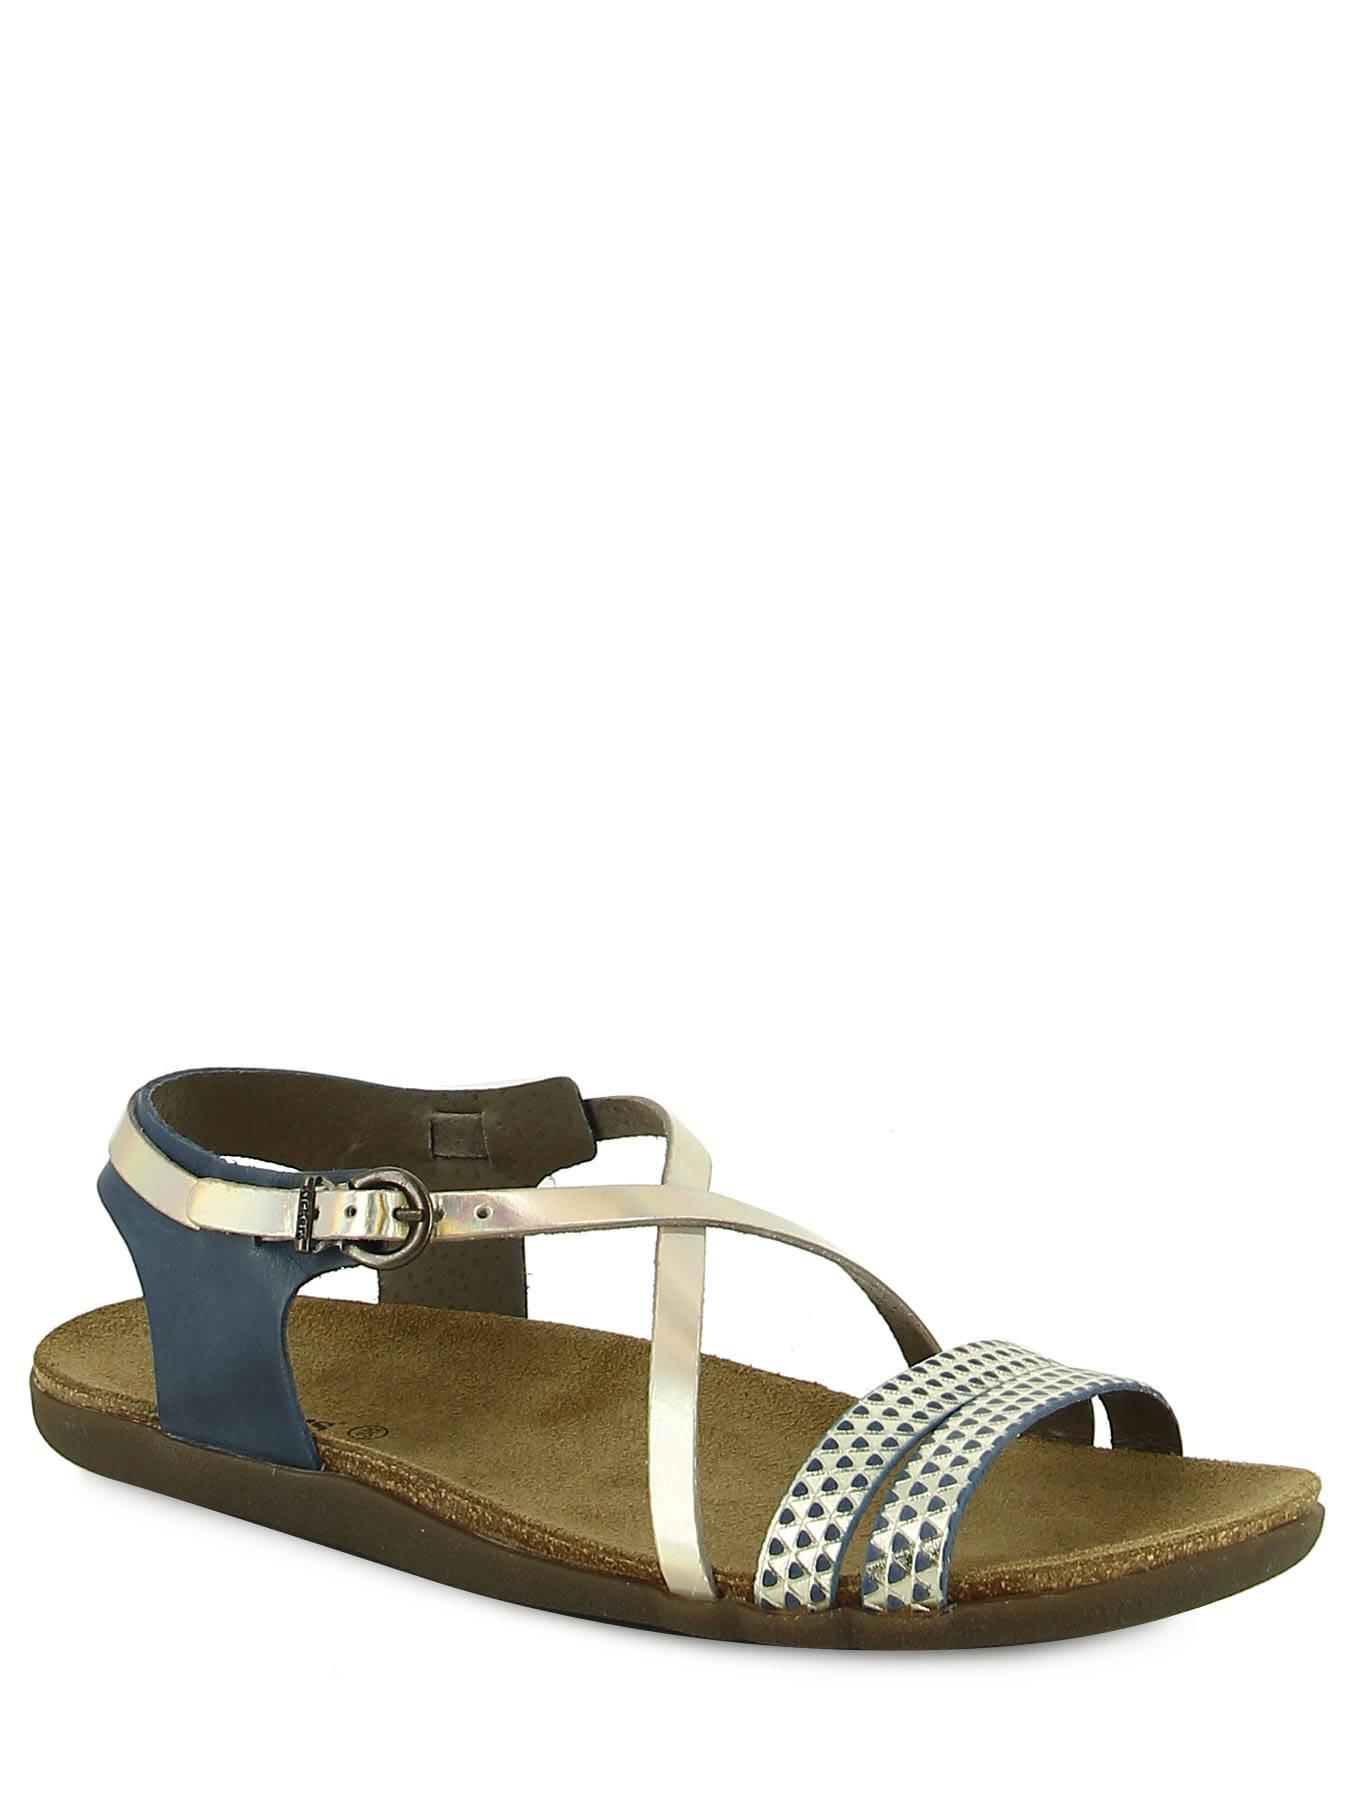 d6c1fabdbf001c Kickers Sandals/flip-flops ATOMIUM on edisac.com